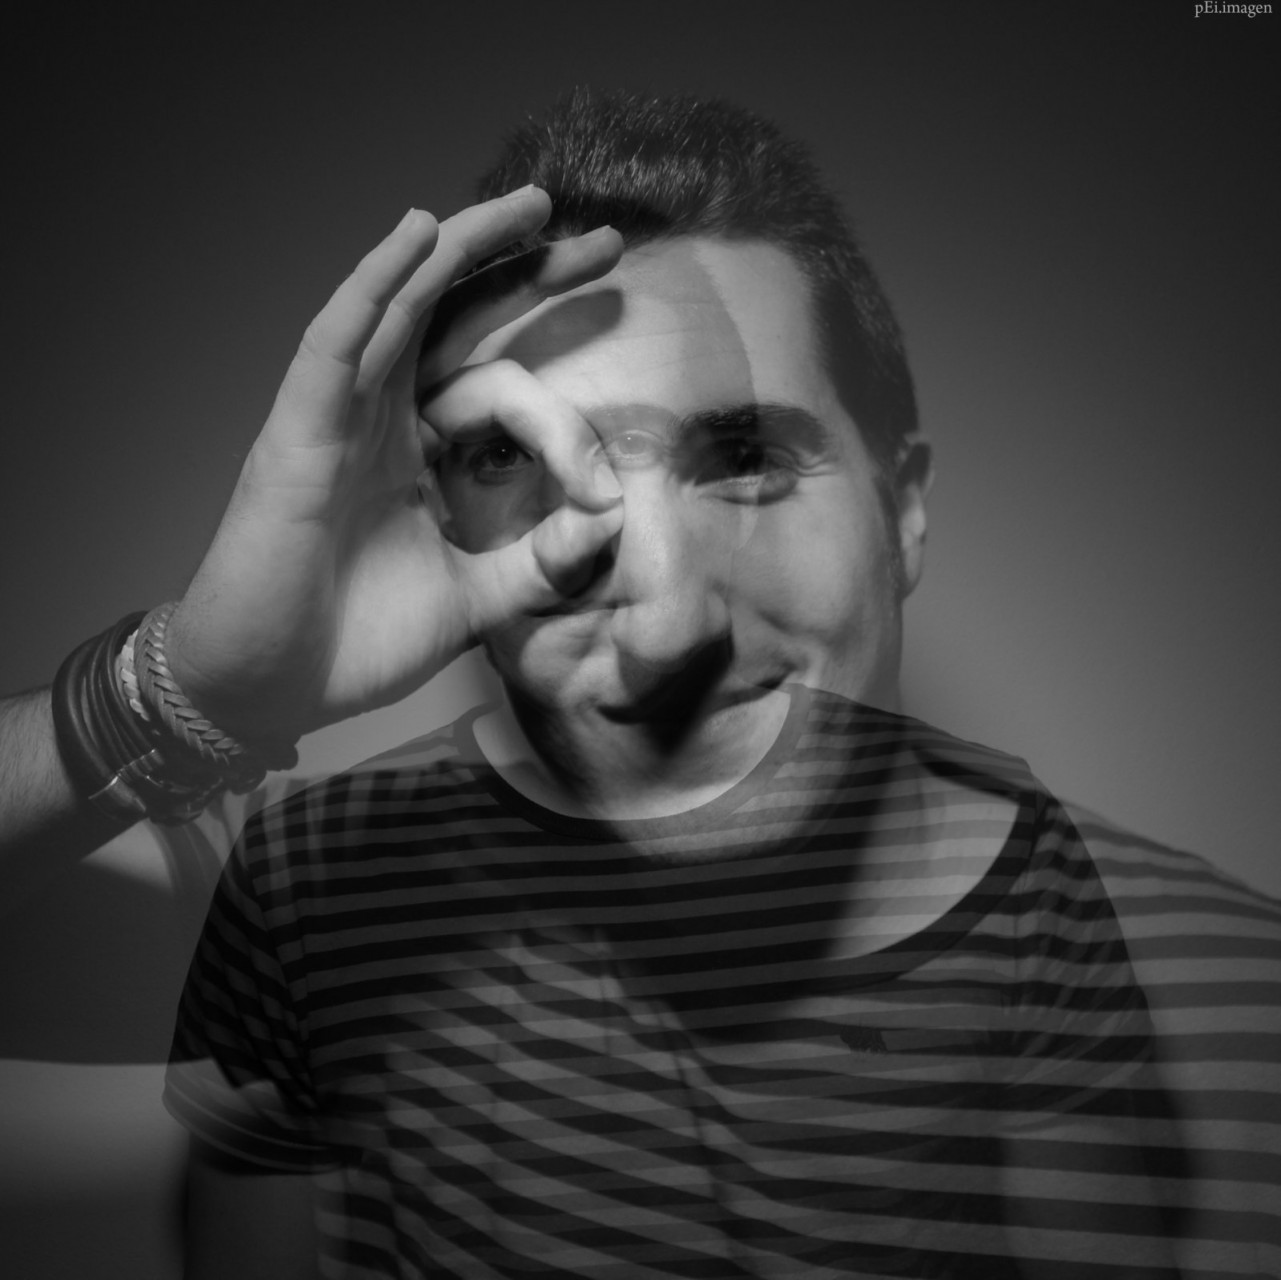 peipegata me myself I proyectos fotografia peipegatafotografia # 016 Dani Arnaz Casla